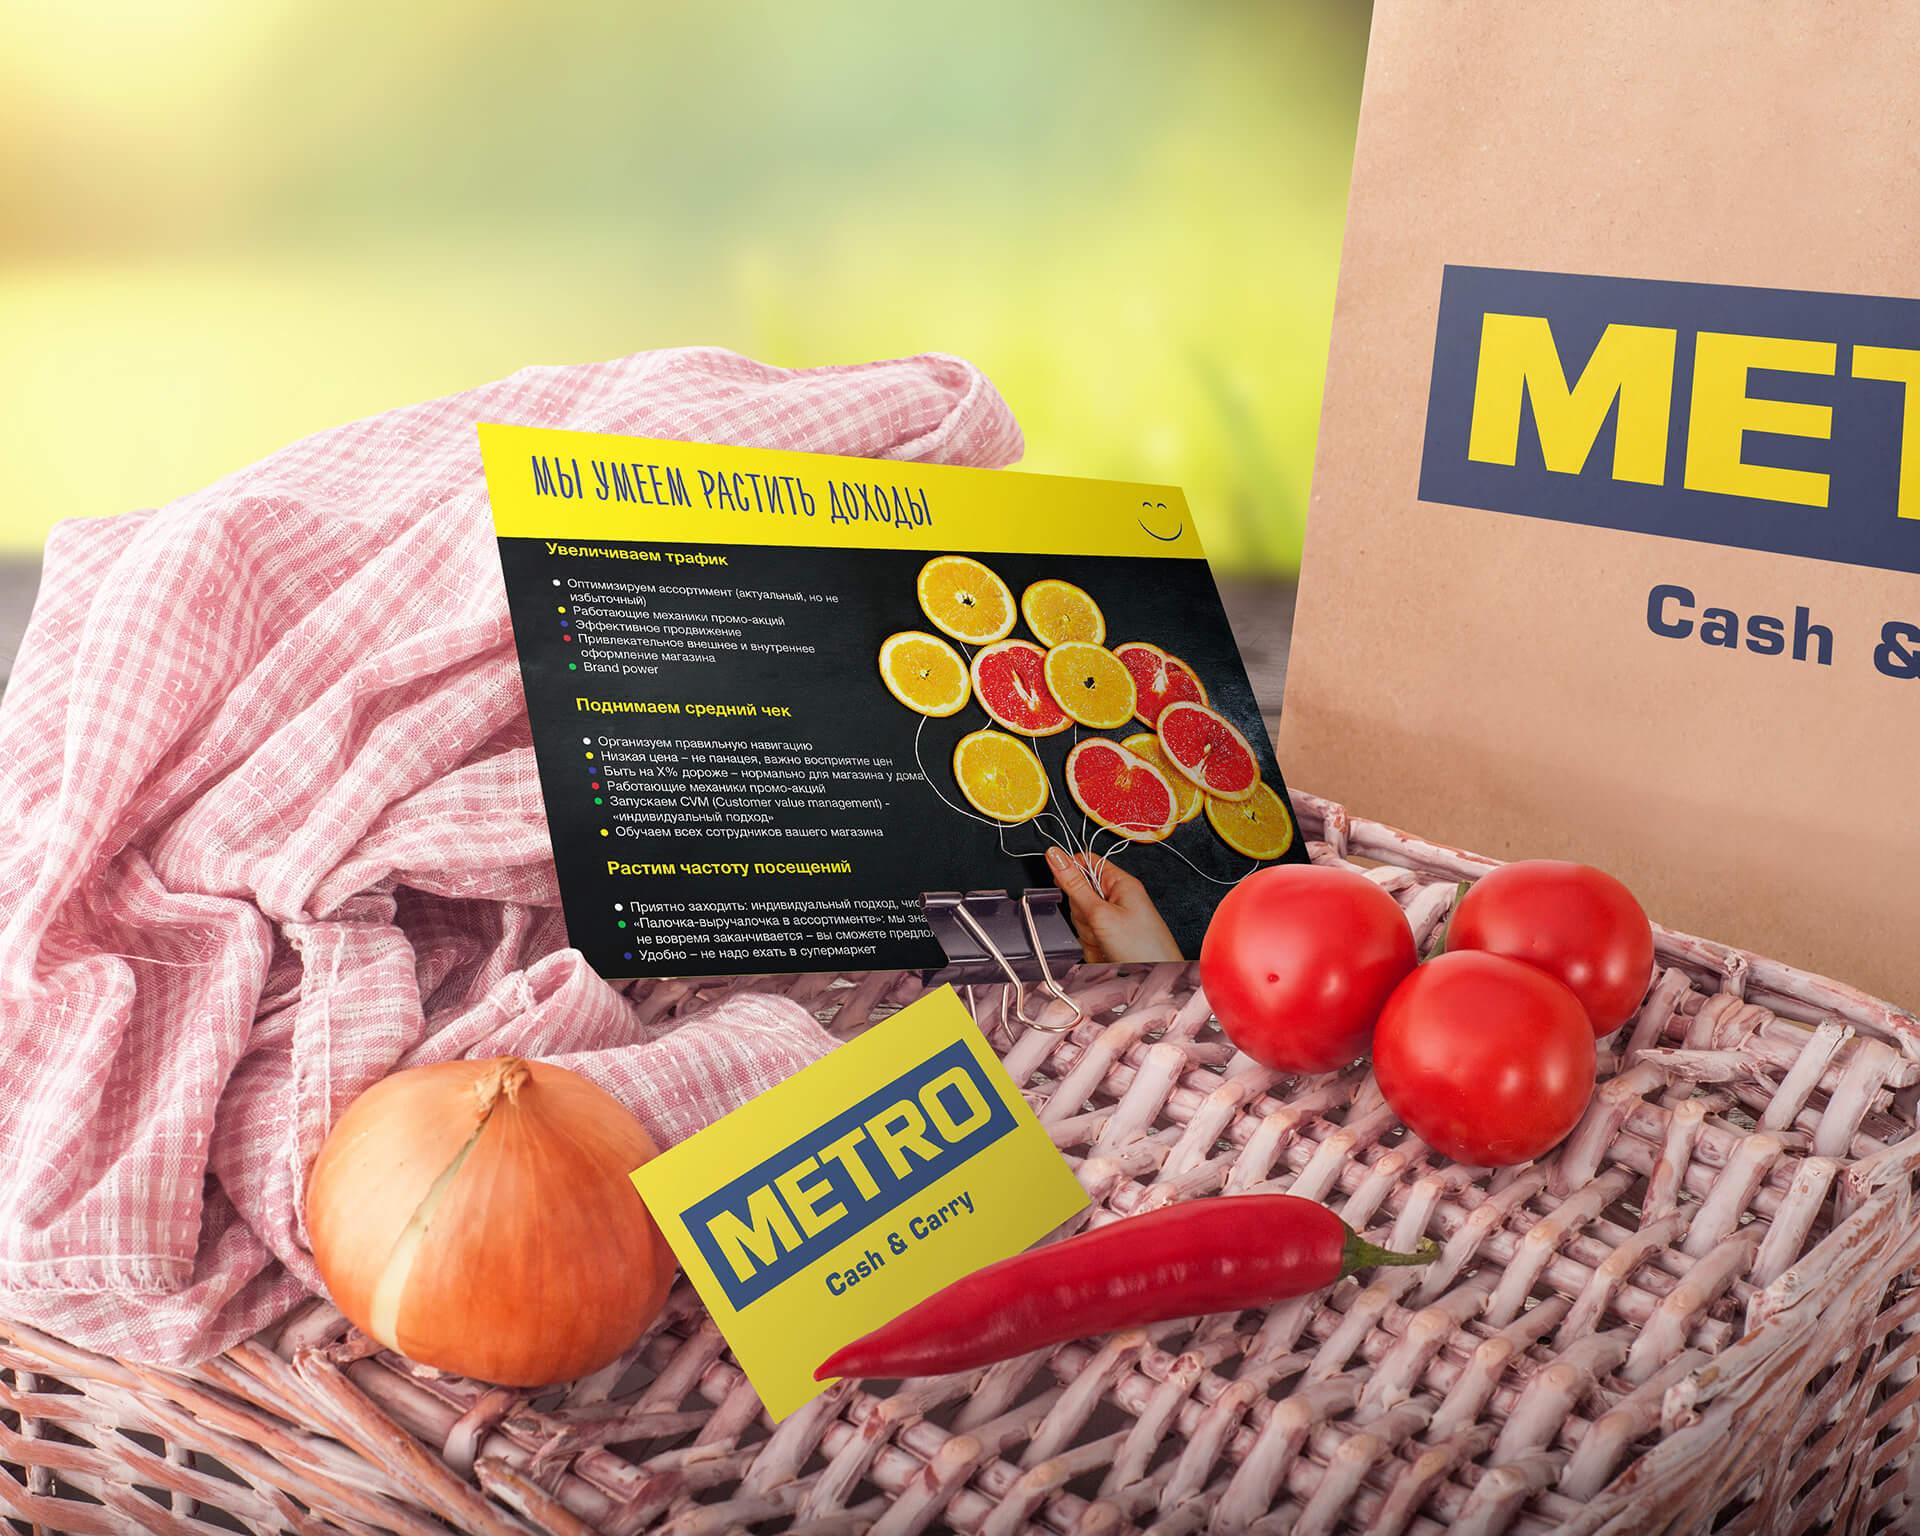 Презентация Metro Cash & Carry | Разработка презентаций на заказ